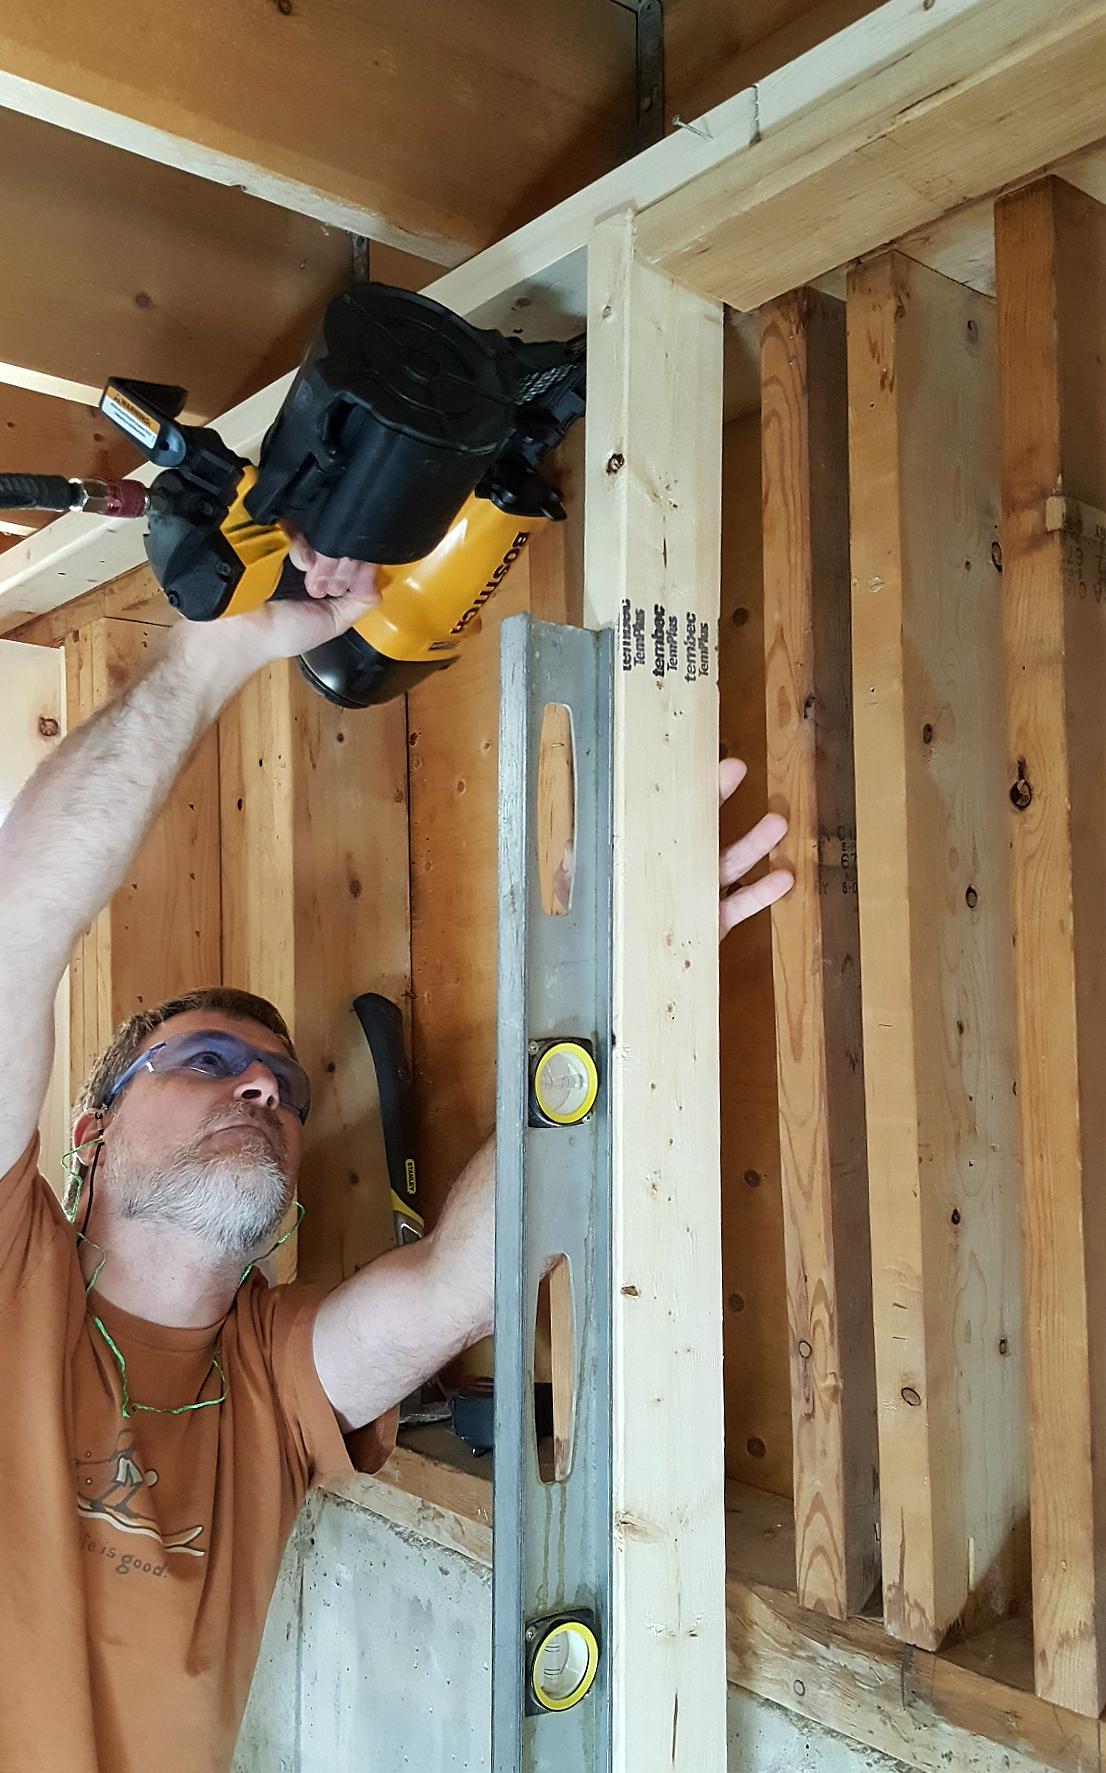 basement framing and spray foam insulation Bostitch framing nailer